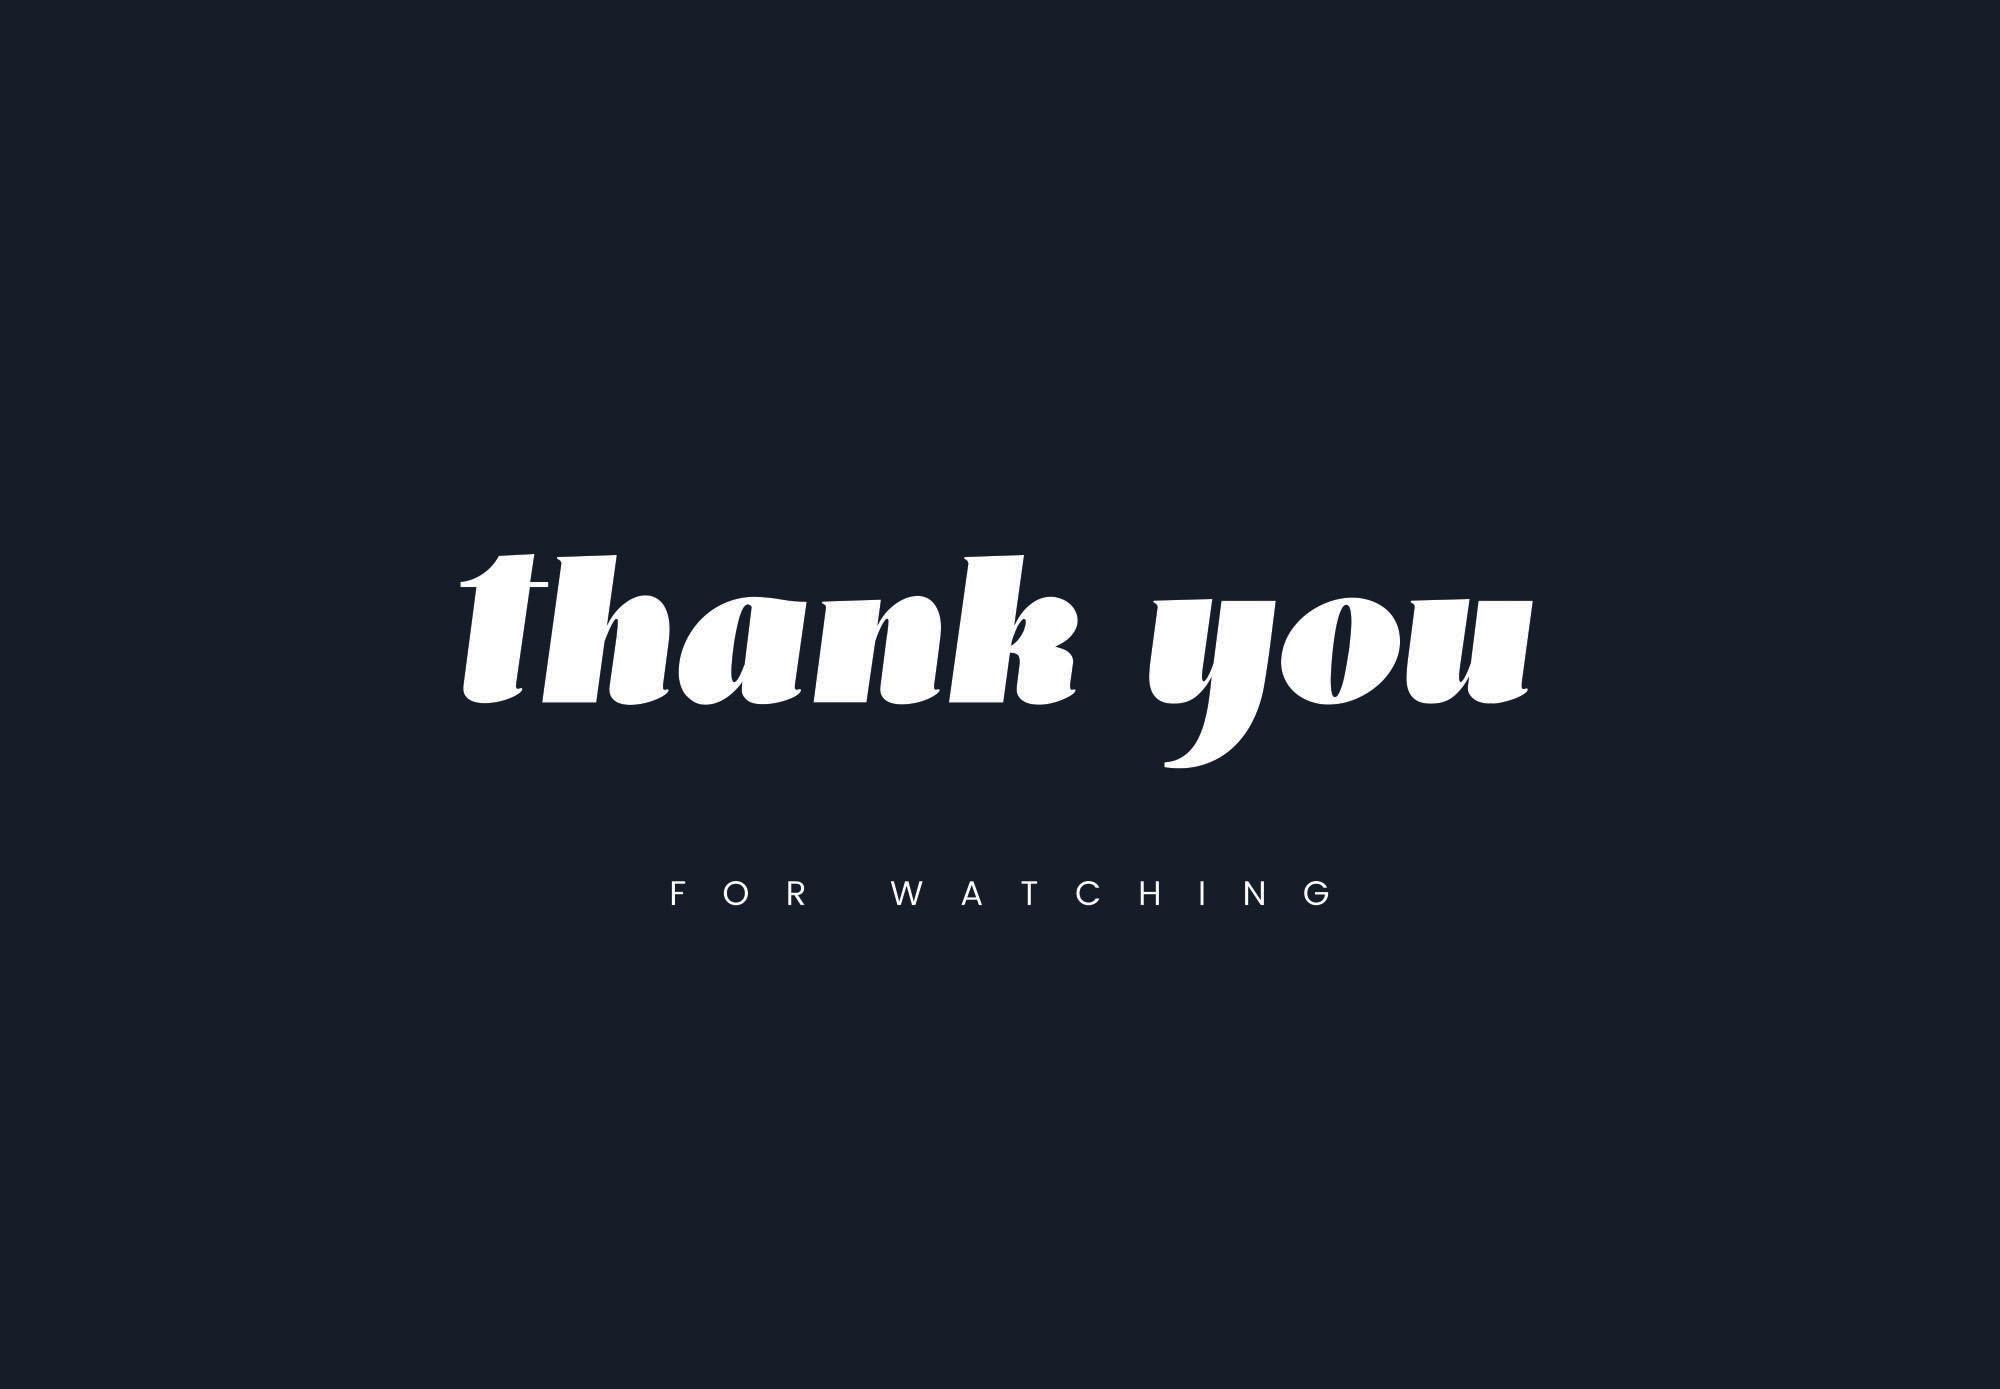 Soigné Font - Thank You